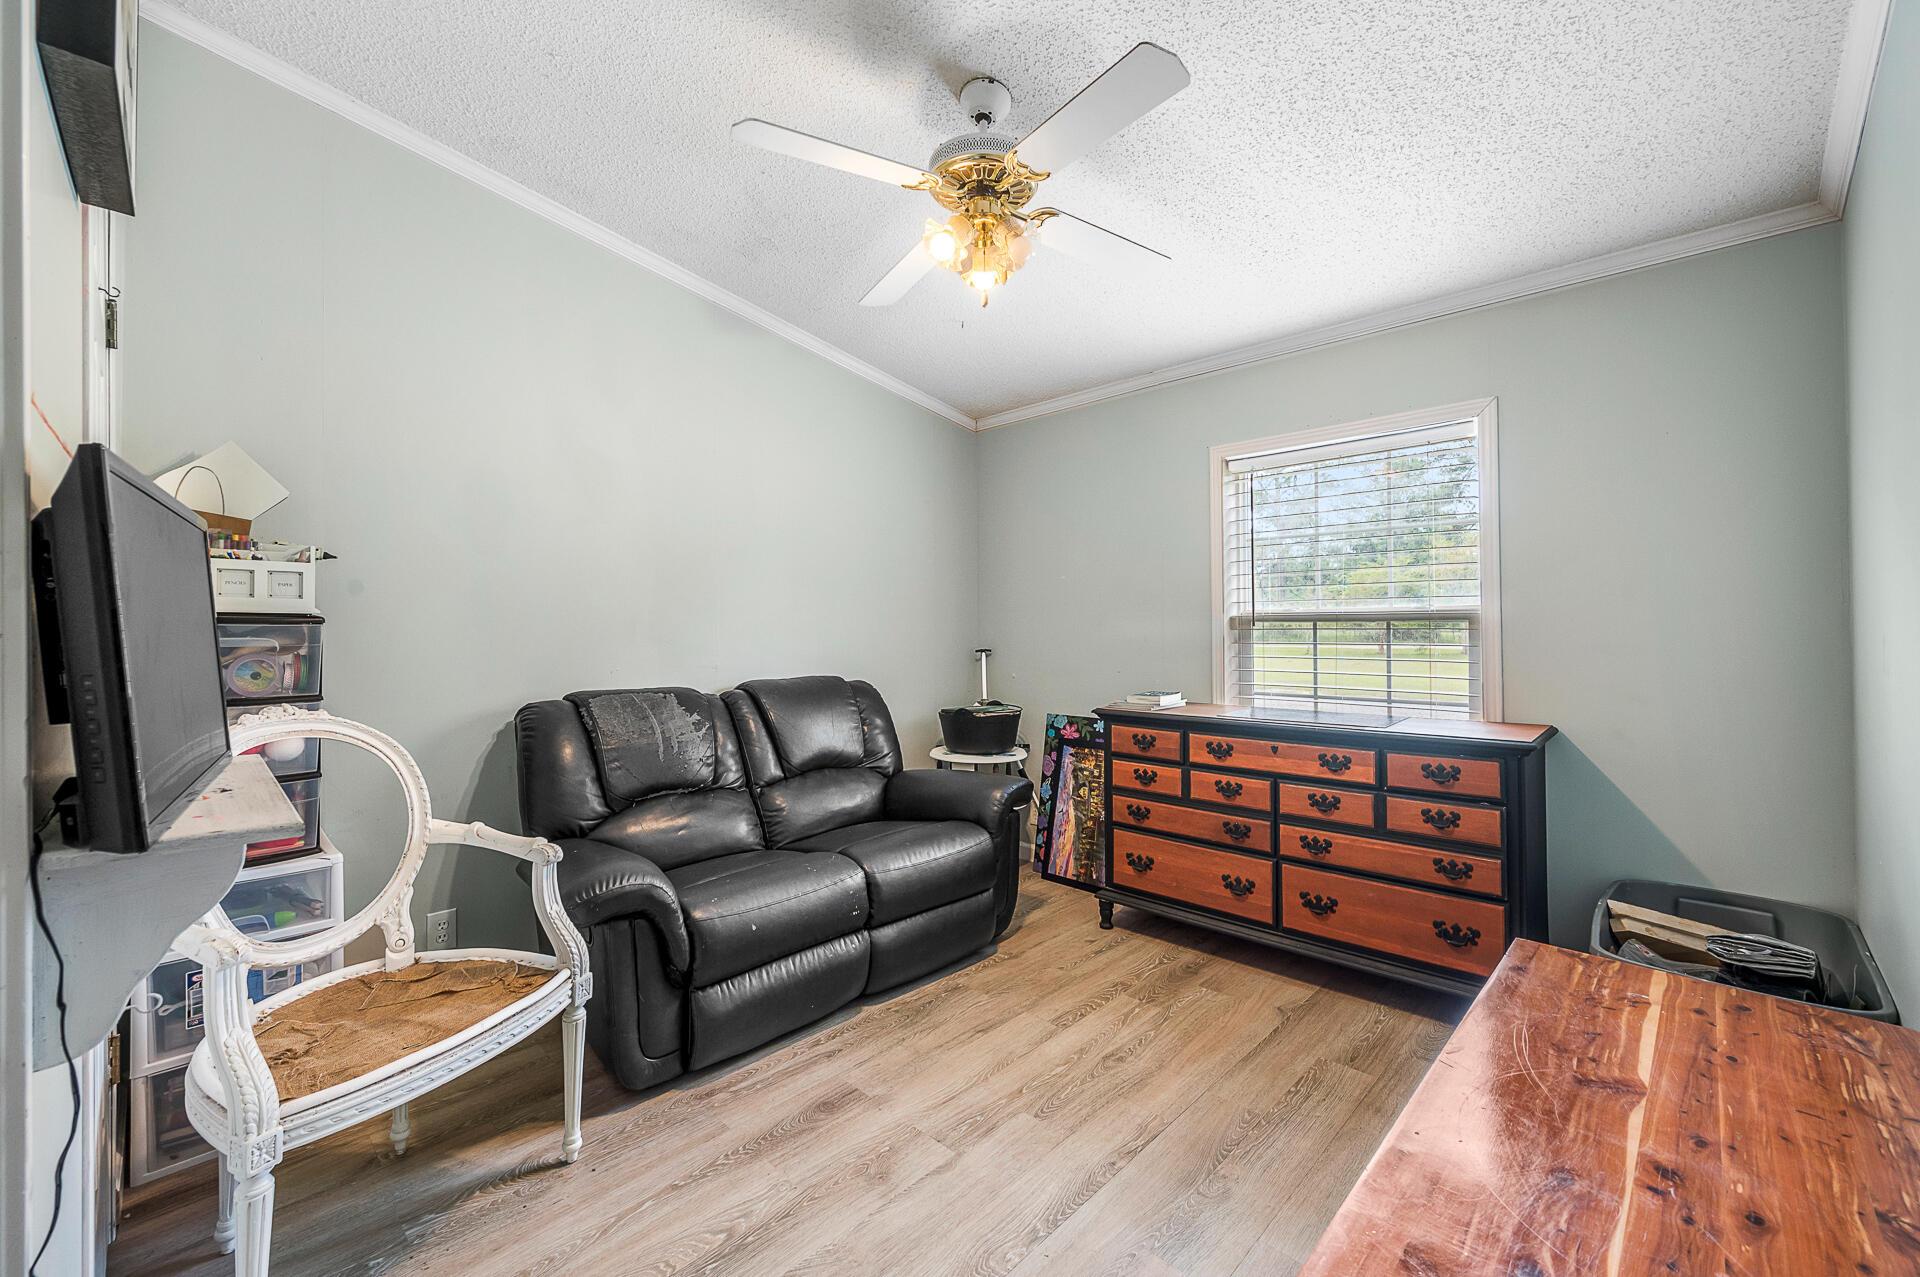 Clemson Terrace Homes For Sale - 250 Medina, Summerville, SC - 15